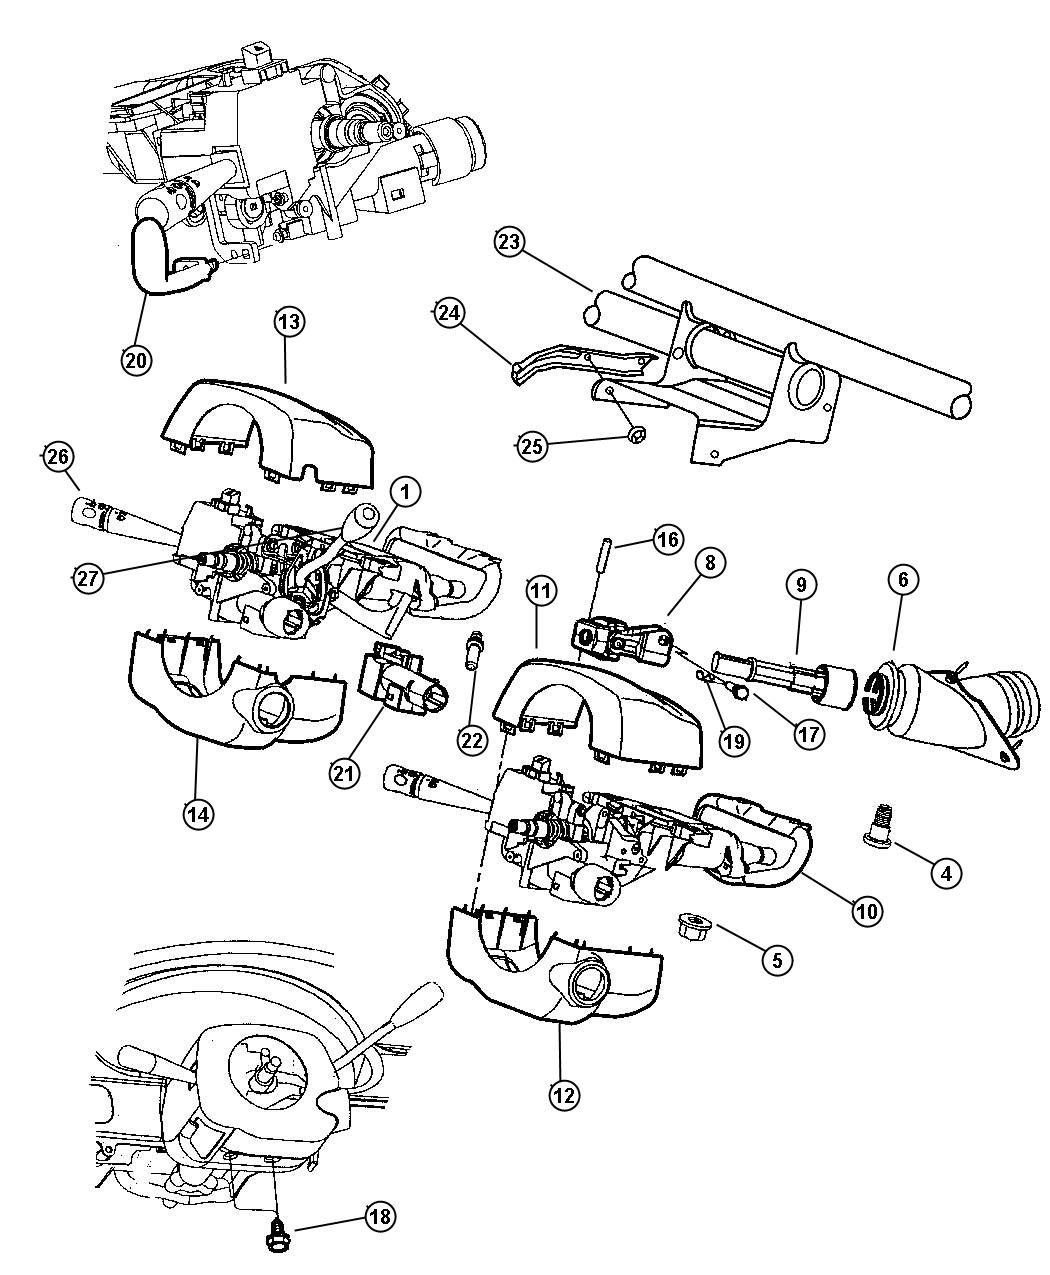 2001 Dodge Intrepid Cable. Gear selector. Column